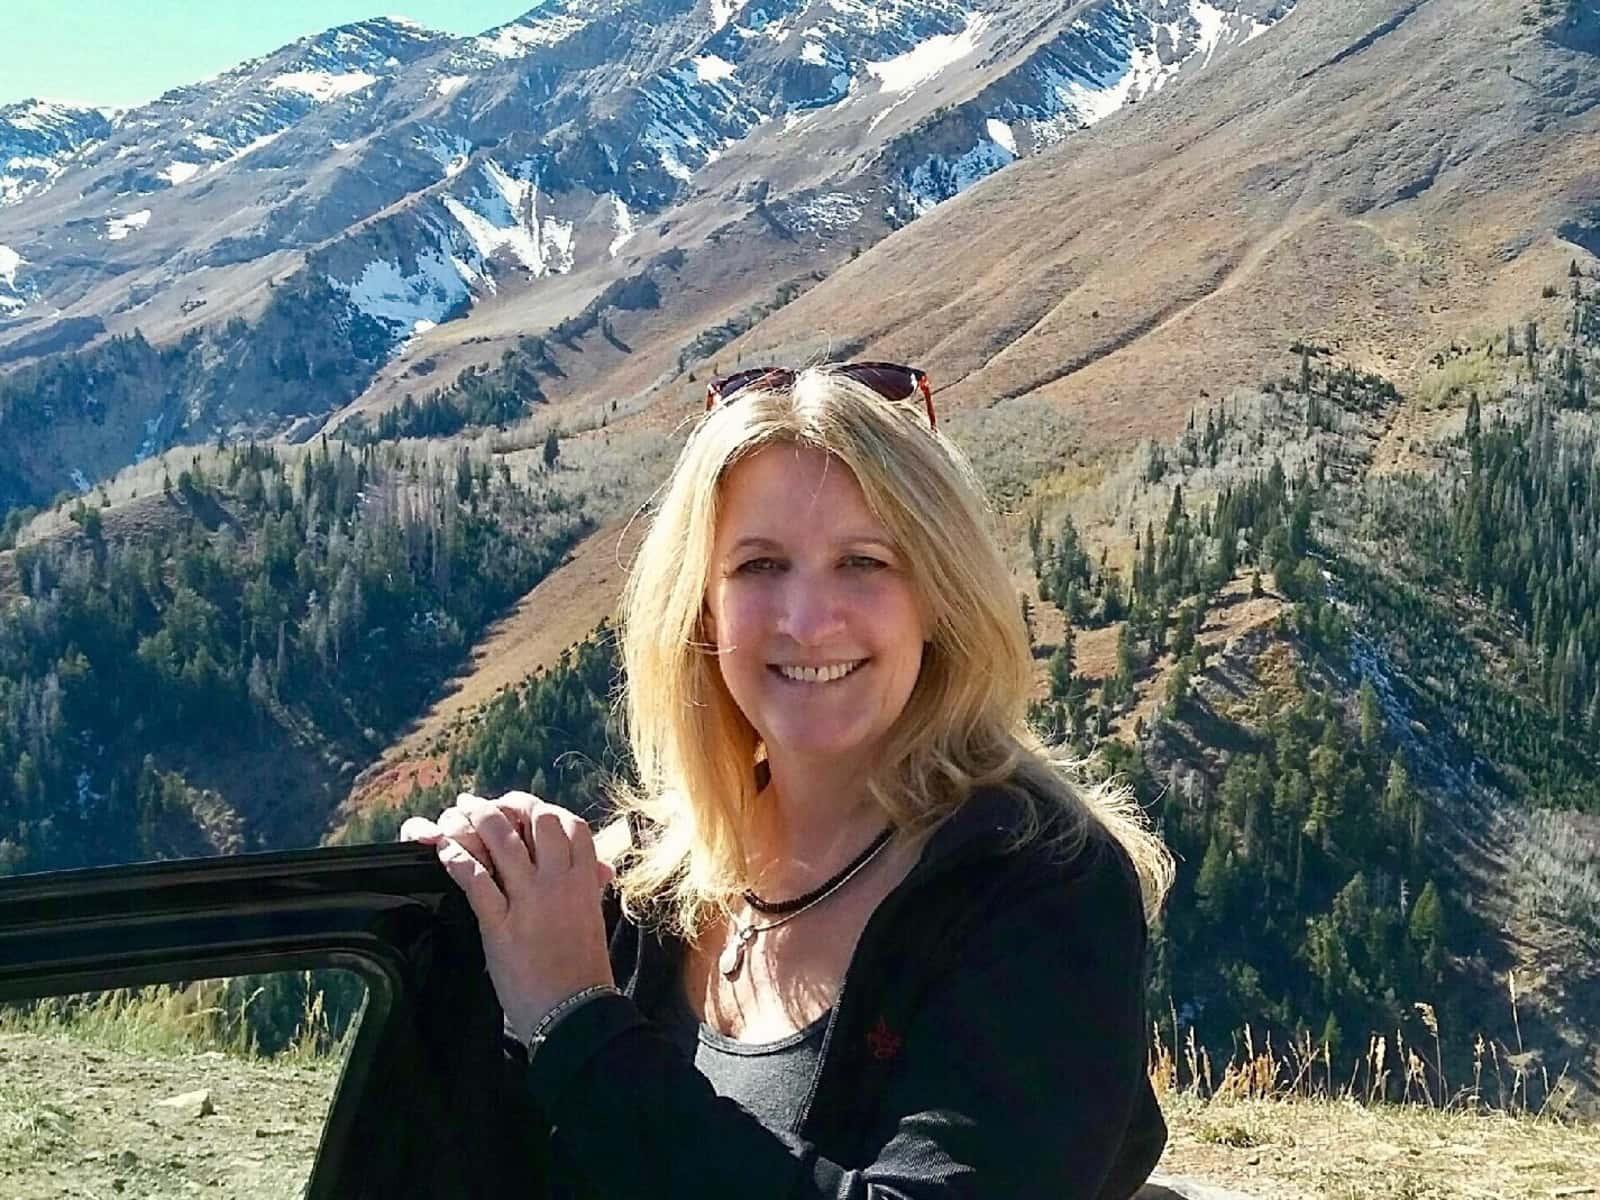 Shelley from Salt Lake City, Utah, United States